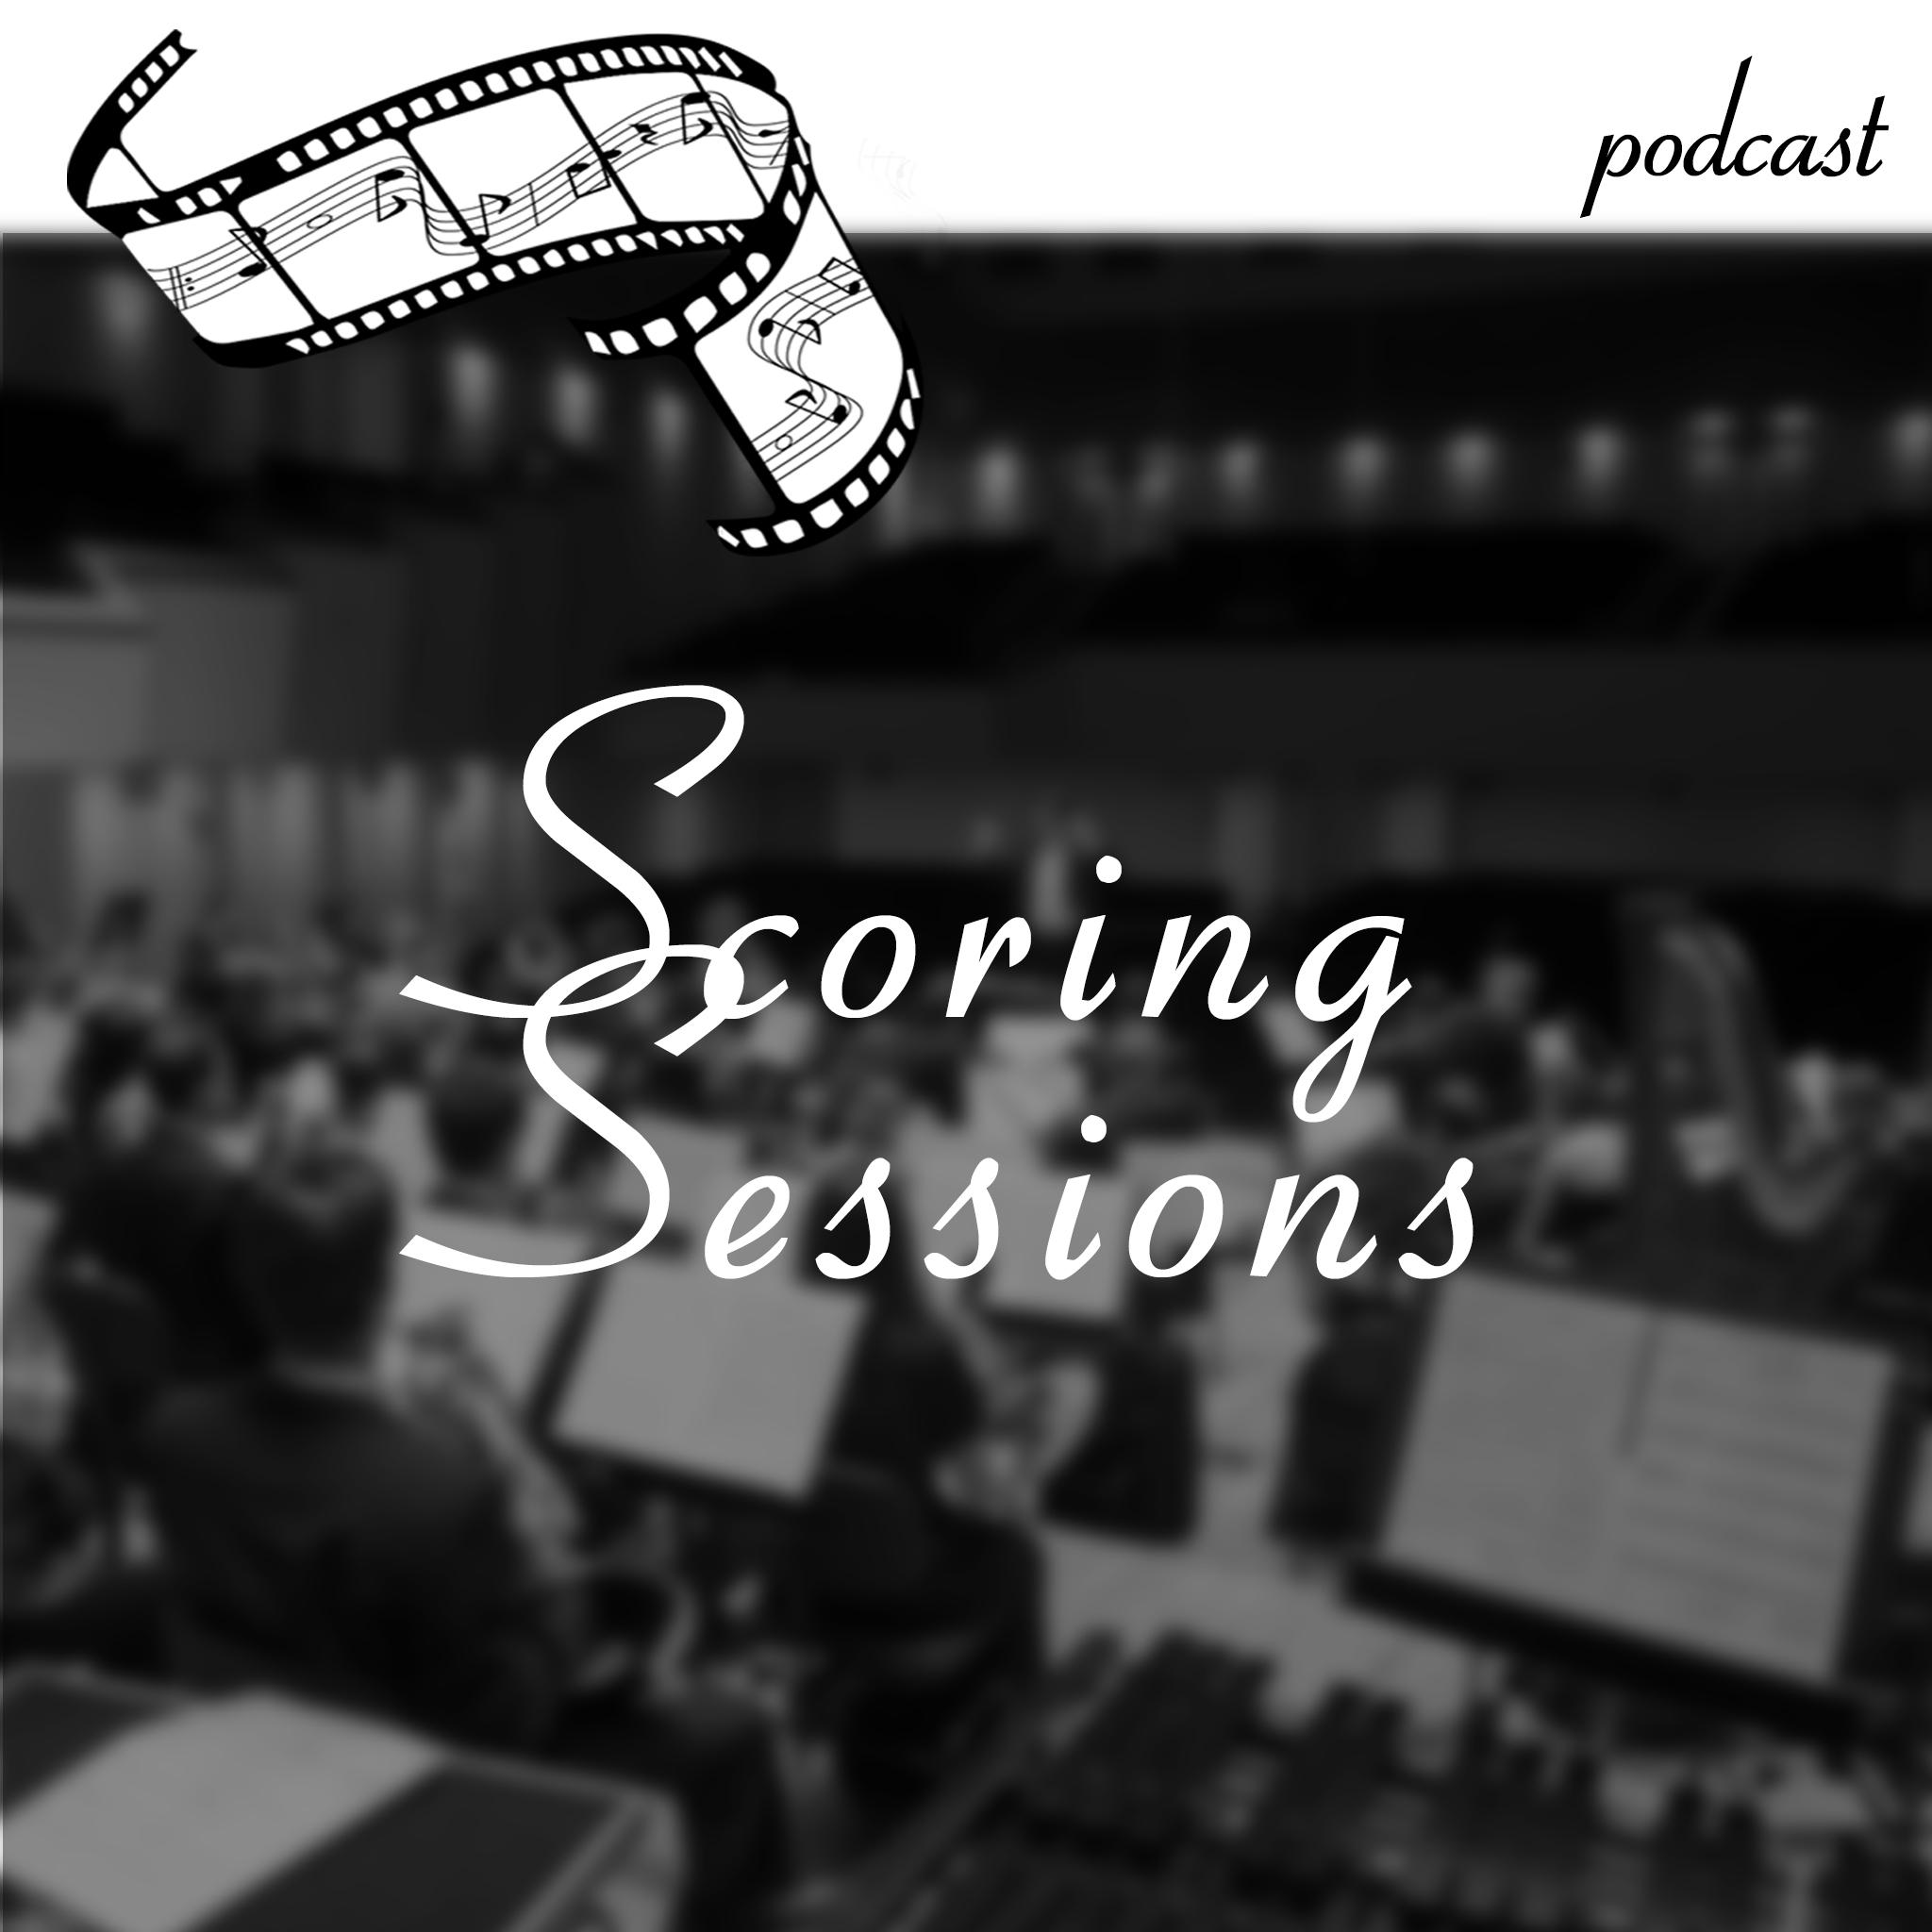 Scoring Sessions